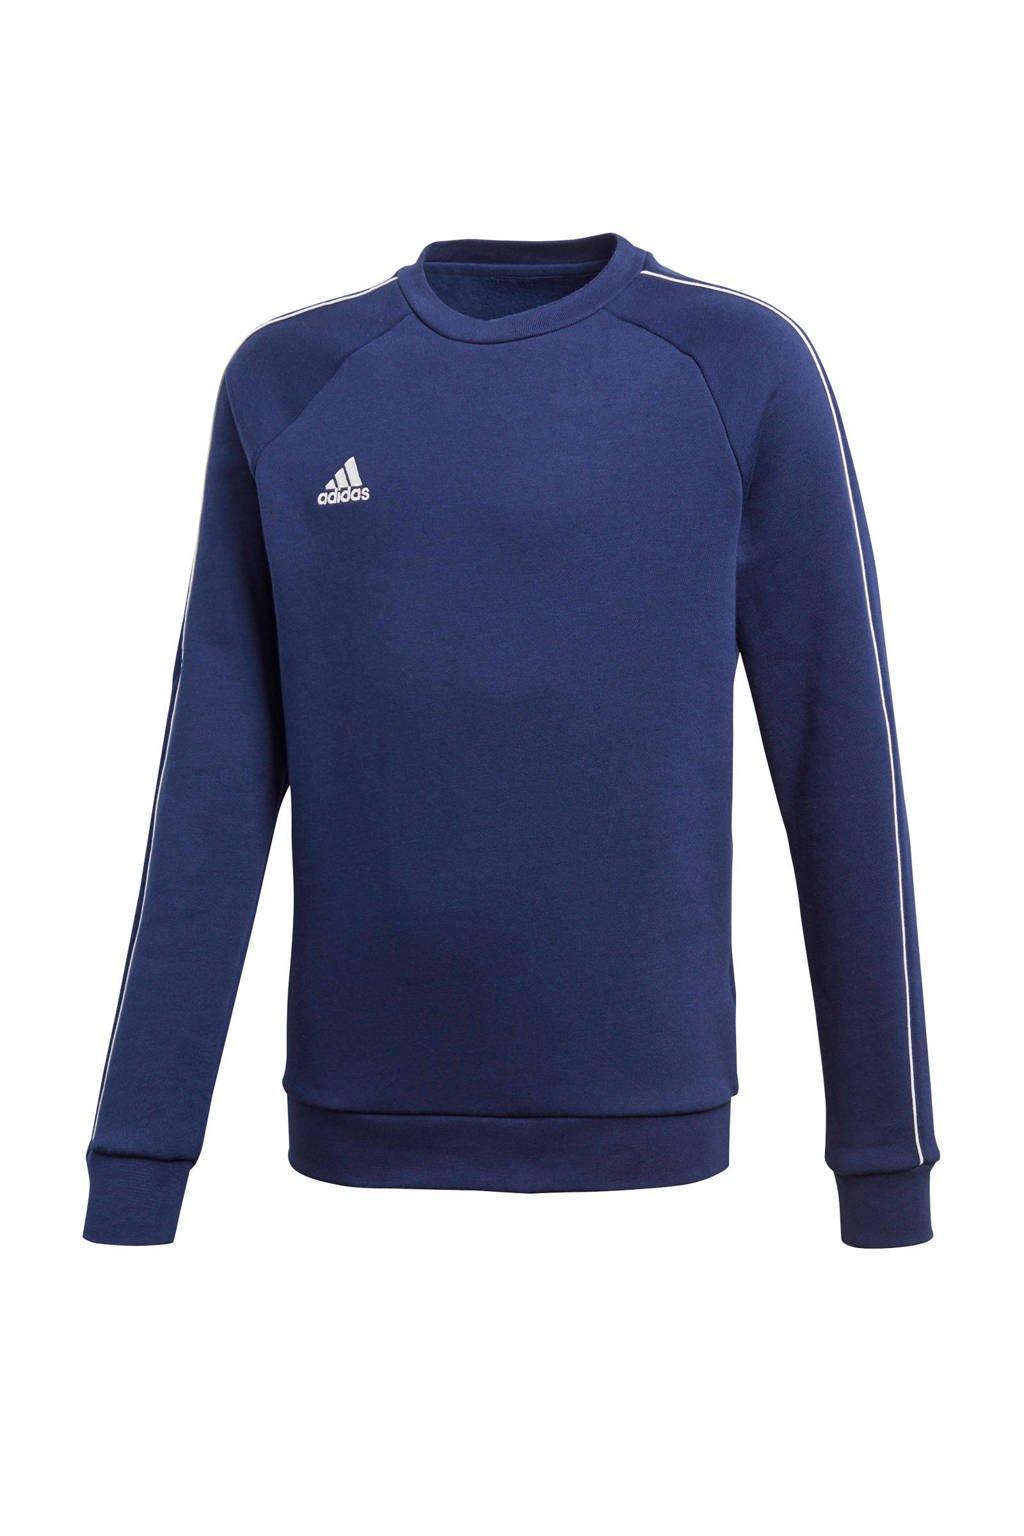 adidas Performance   sportsweater Core 18 donkerblauw, Donkerblauw/wit